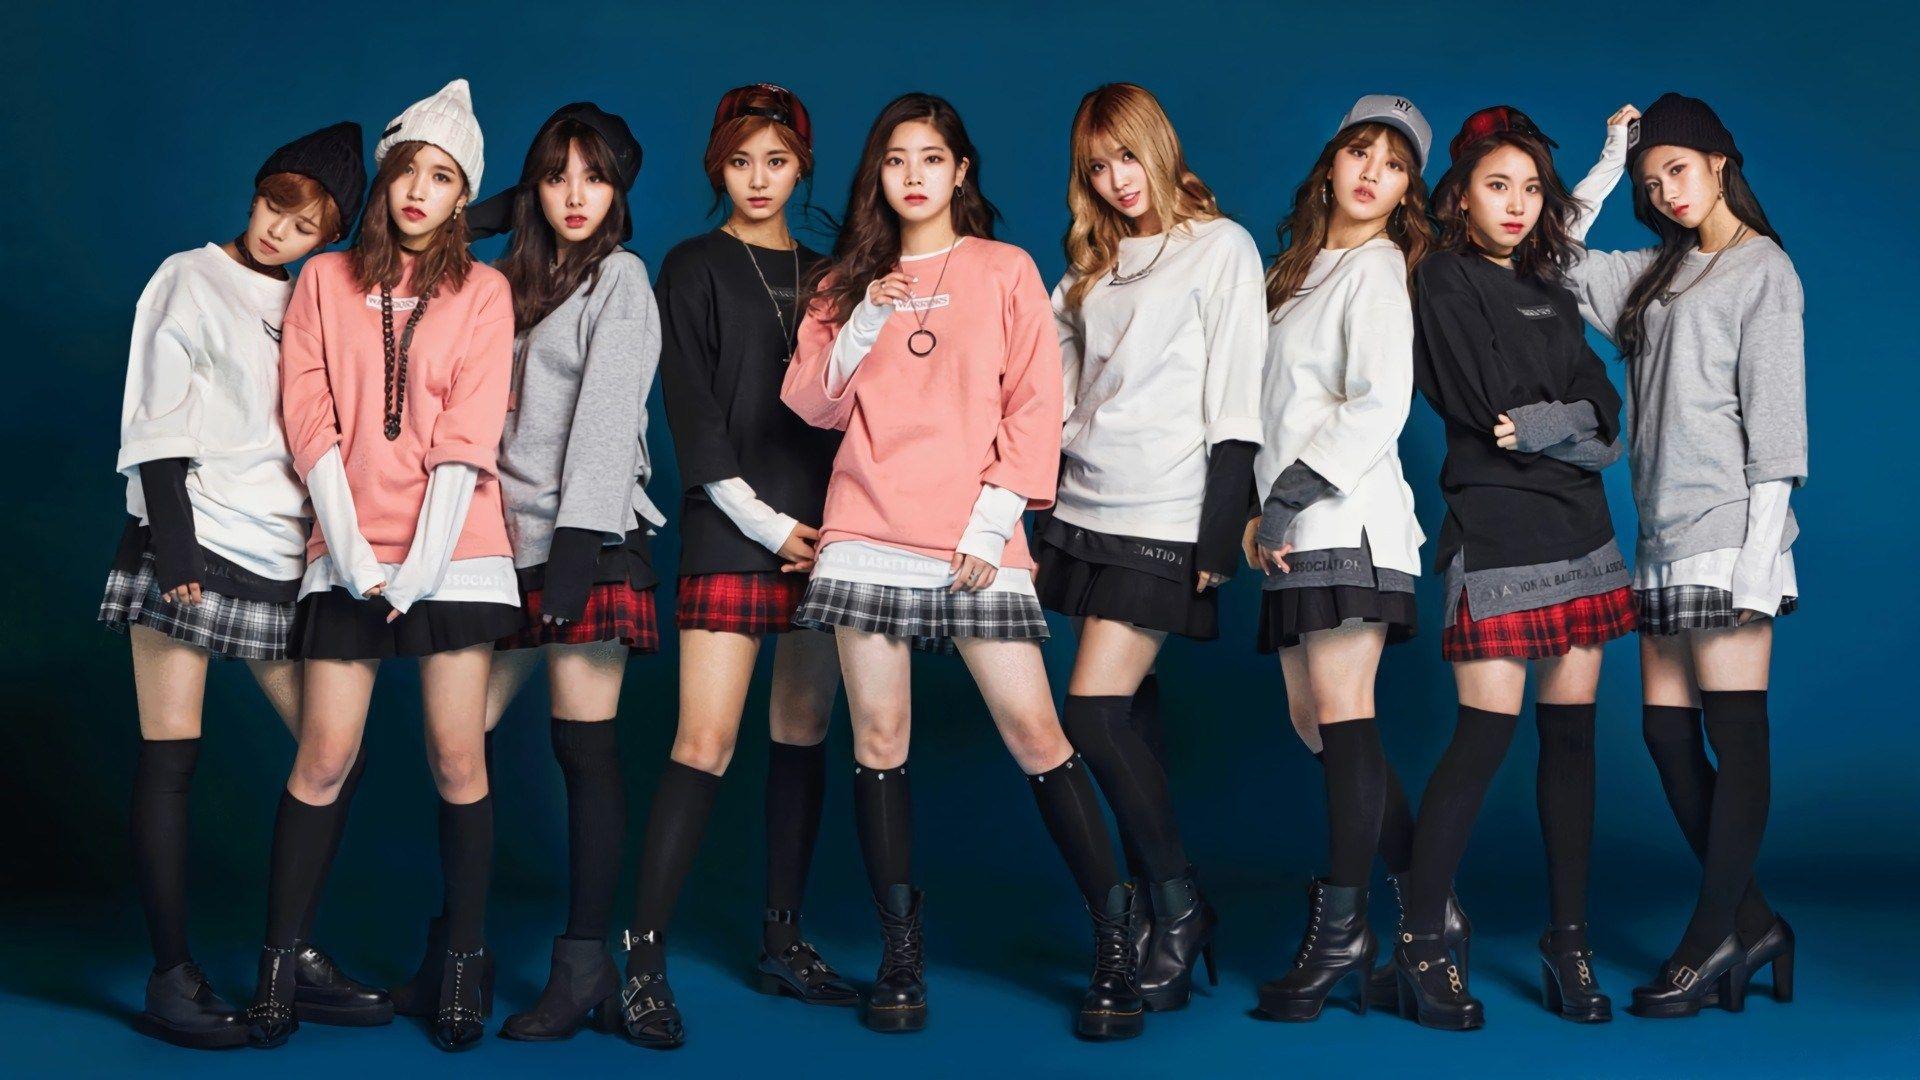 Twice Wallpaper Computer Desktop Twice Photoshoot Nba Fashion Kpop Girls